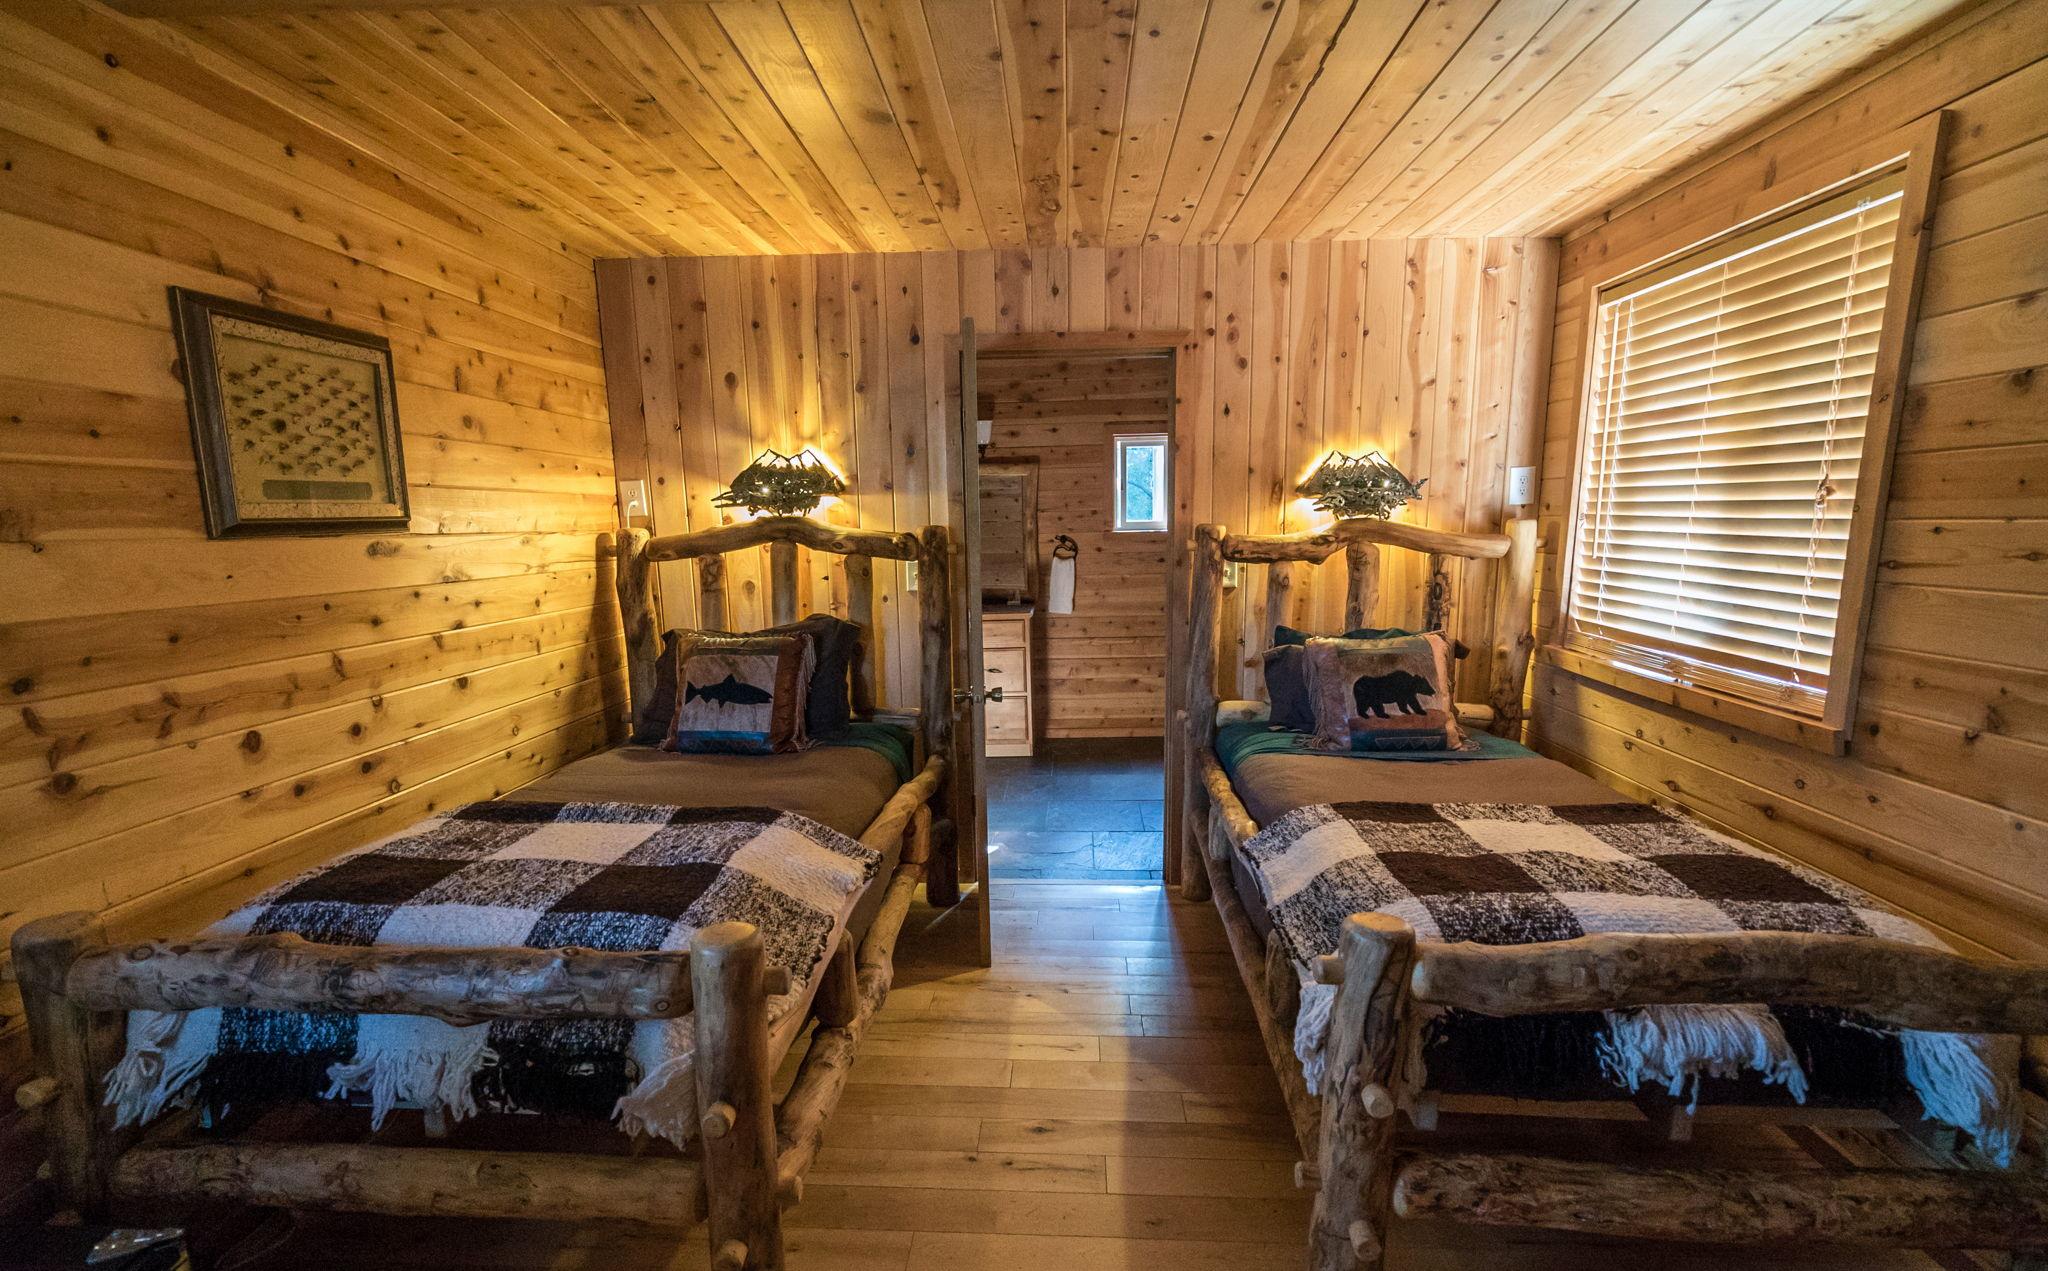 Alaskan fishing cabins